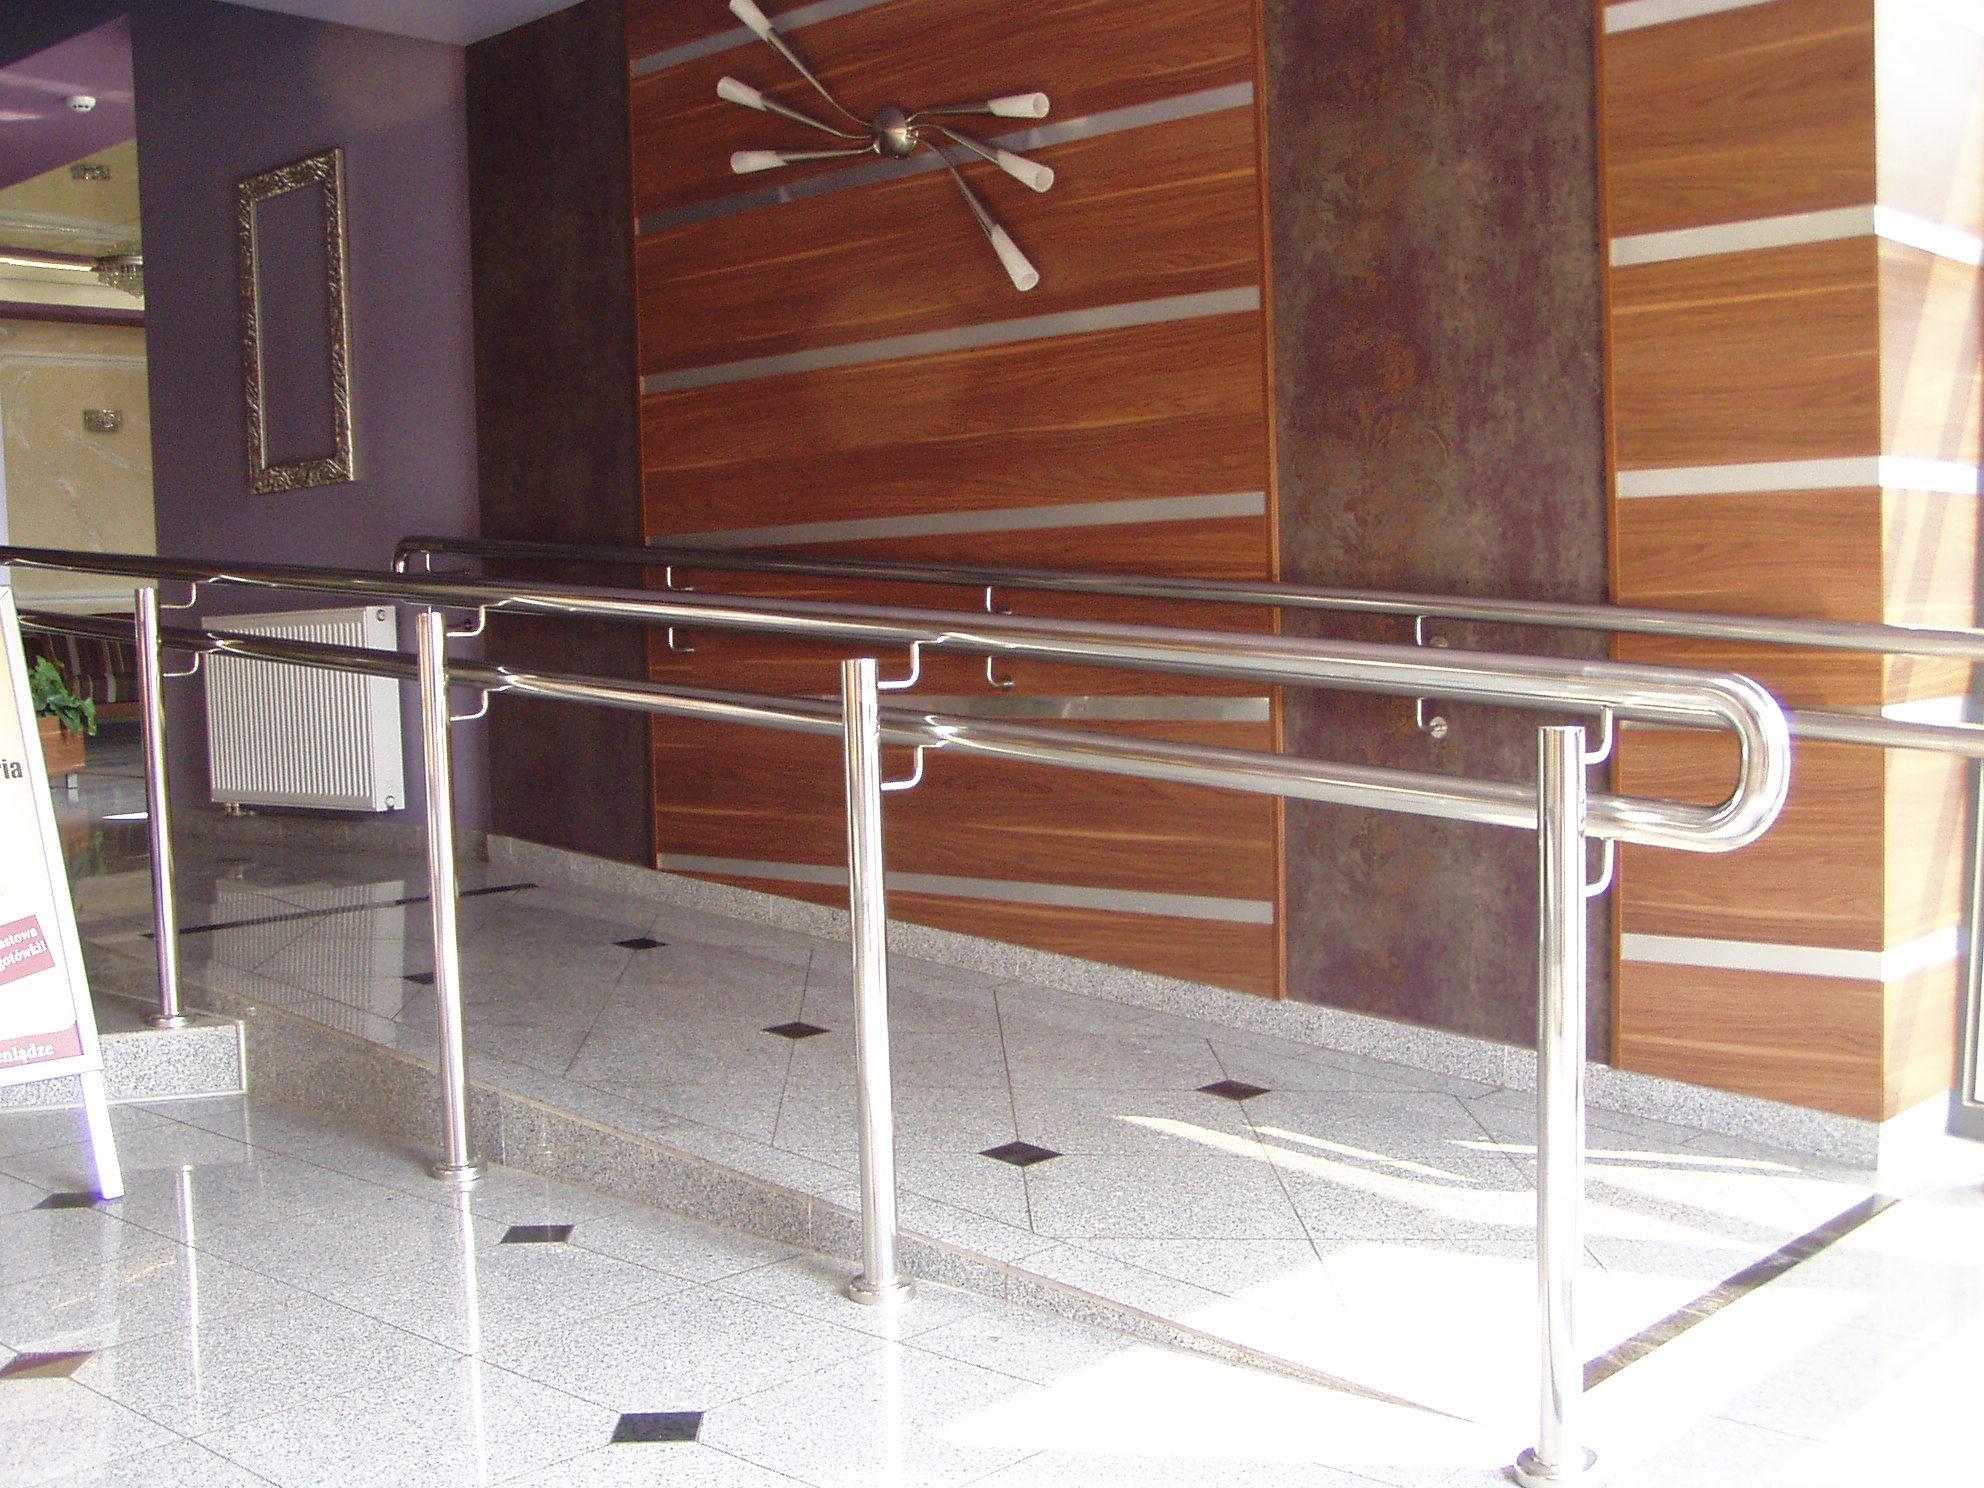 elementy do balustrad ze stali